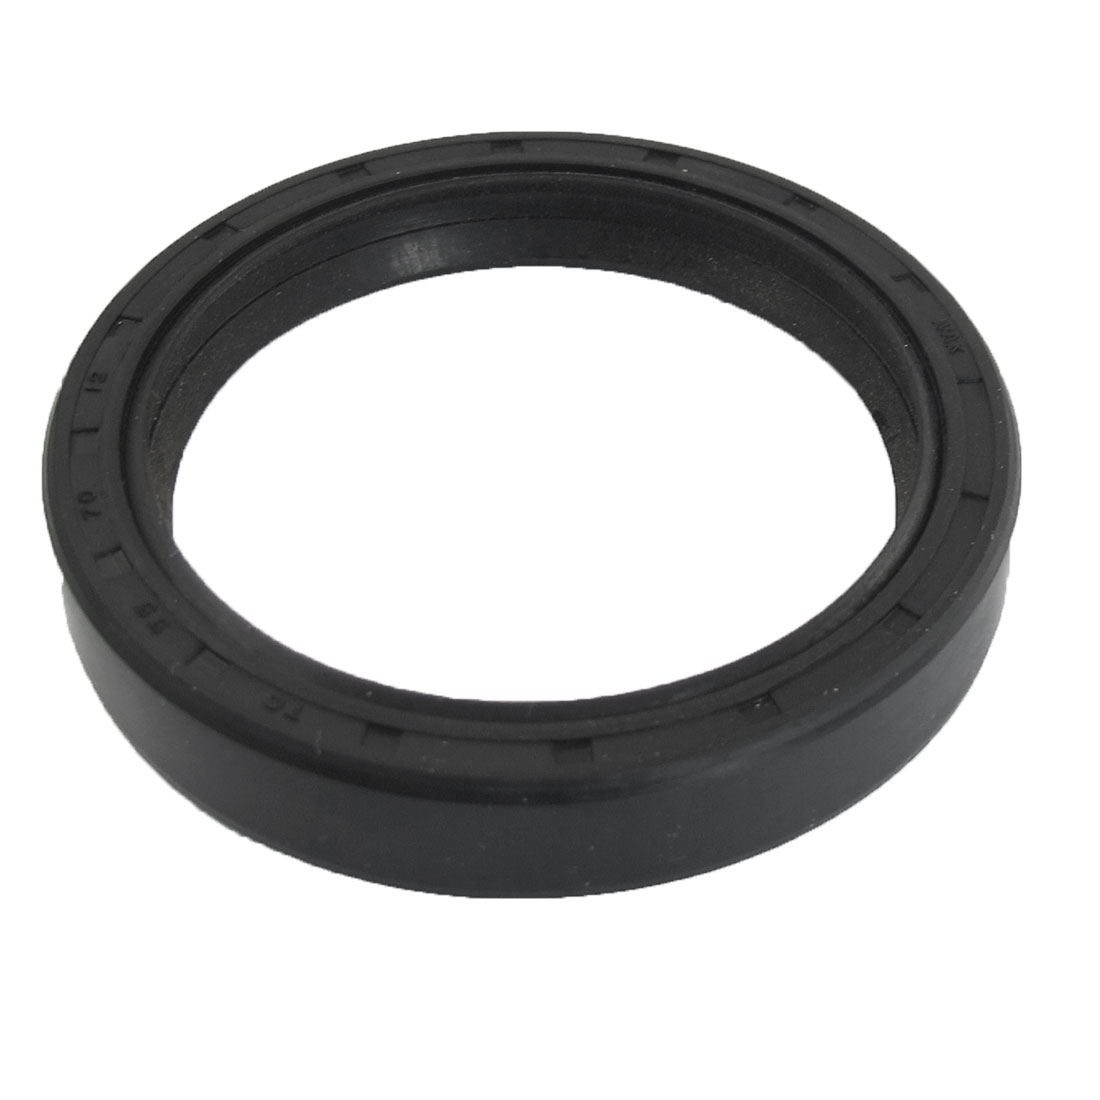 Black Nitrile Rubber Dual Lips Oil Shaft Seal TC 55mm x 70mm x 12mm